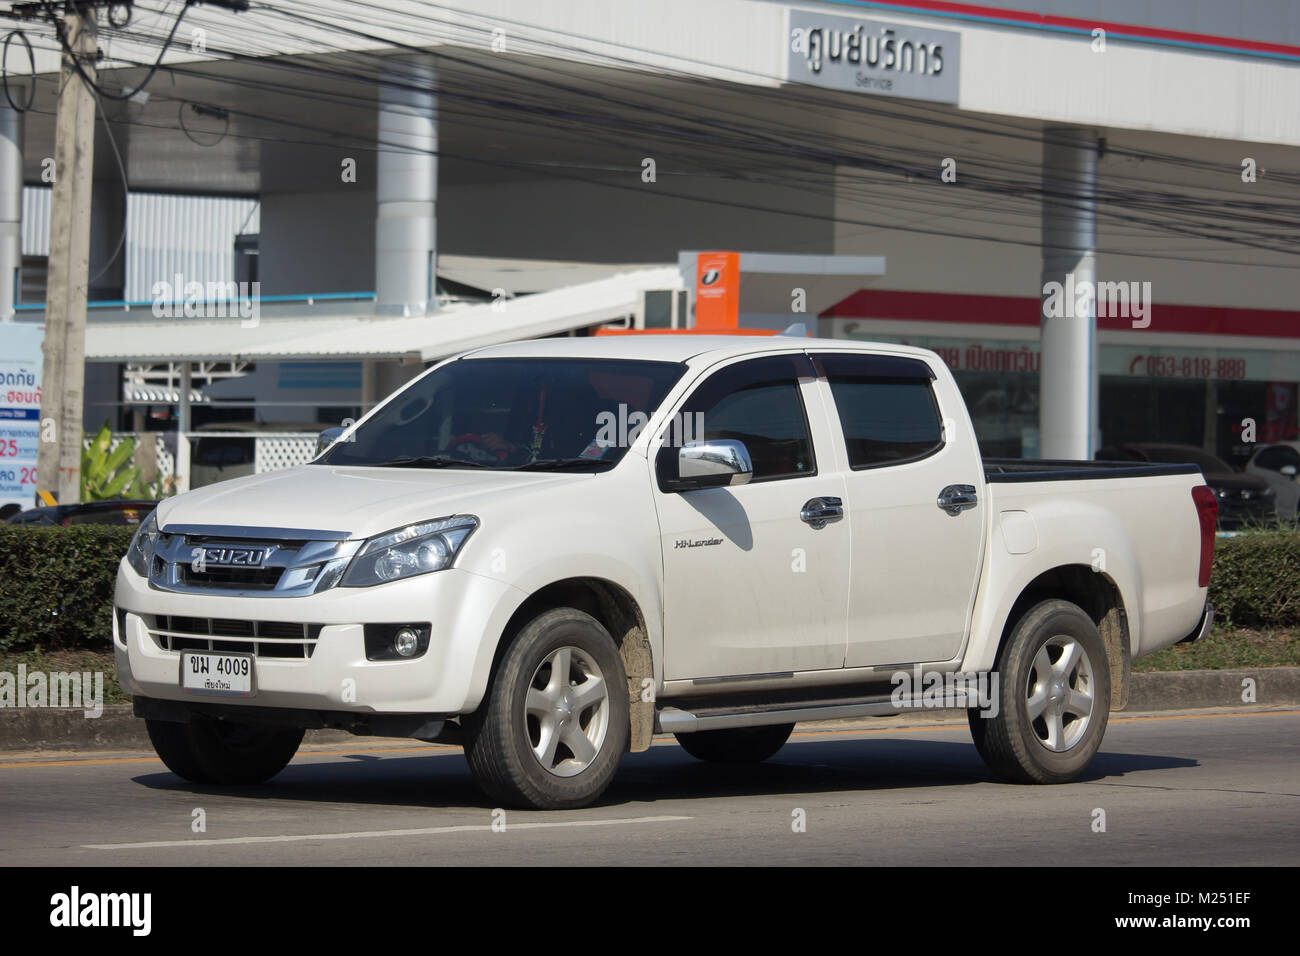 chiang mai, thailand -january 9 2018: private isuzu dmax pickup